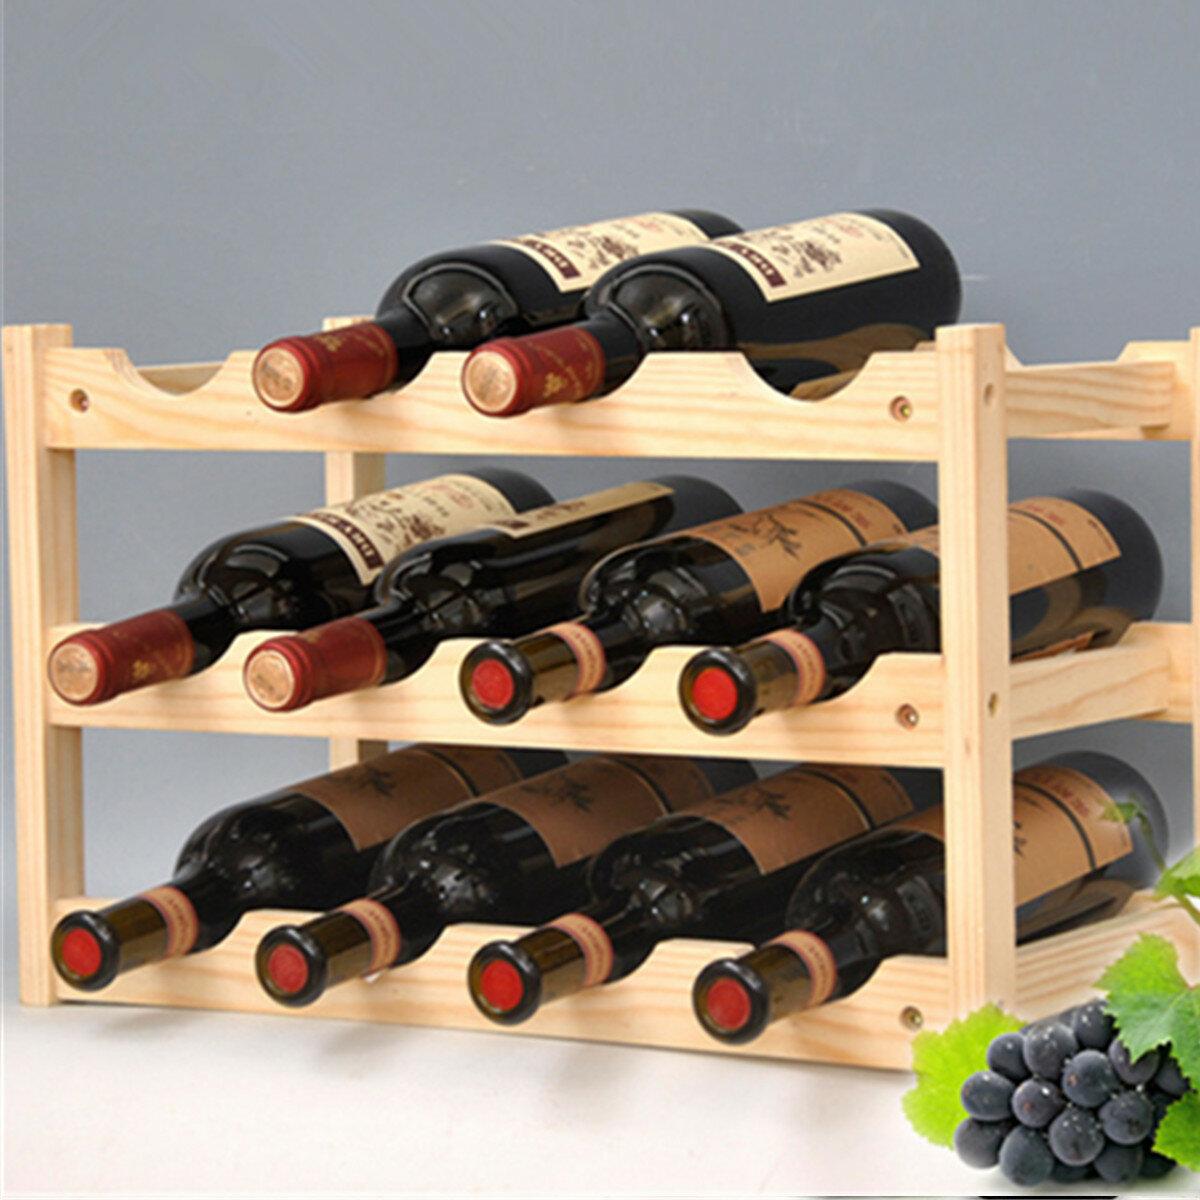 Wooden Rack 12 Bottles Storage Shelf Home Bar Cabinet Decorations, Banggood  - buy with discount